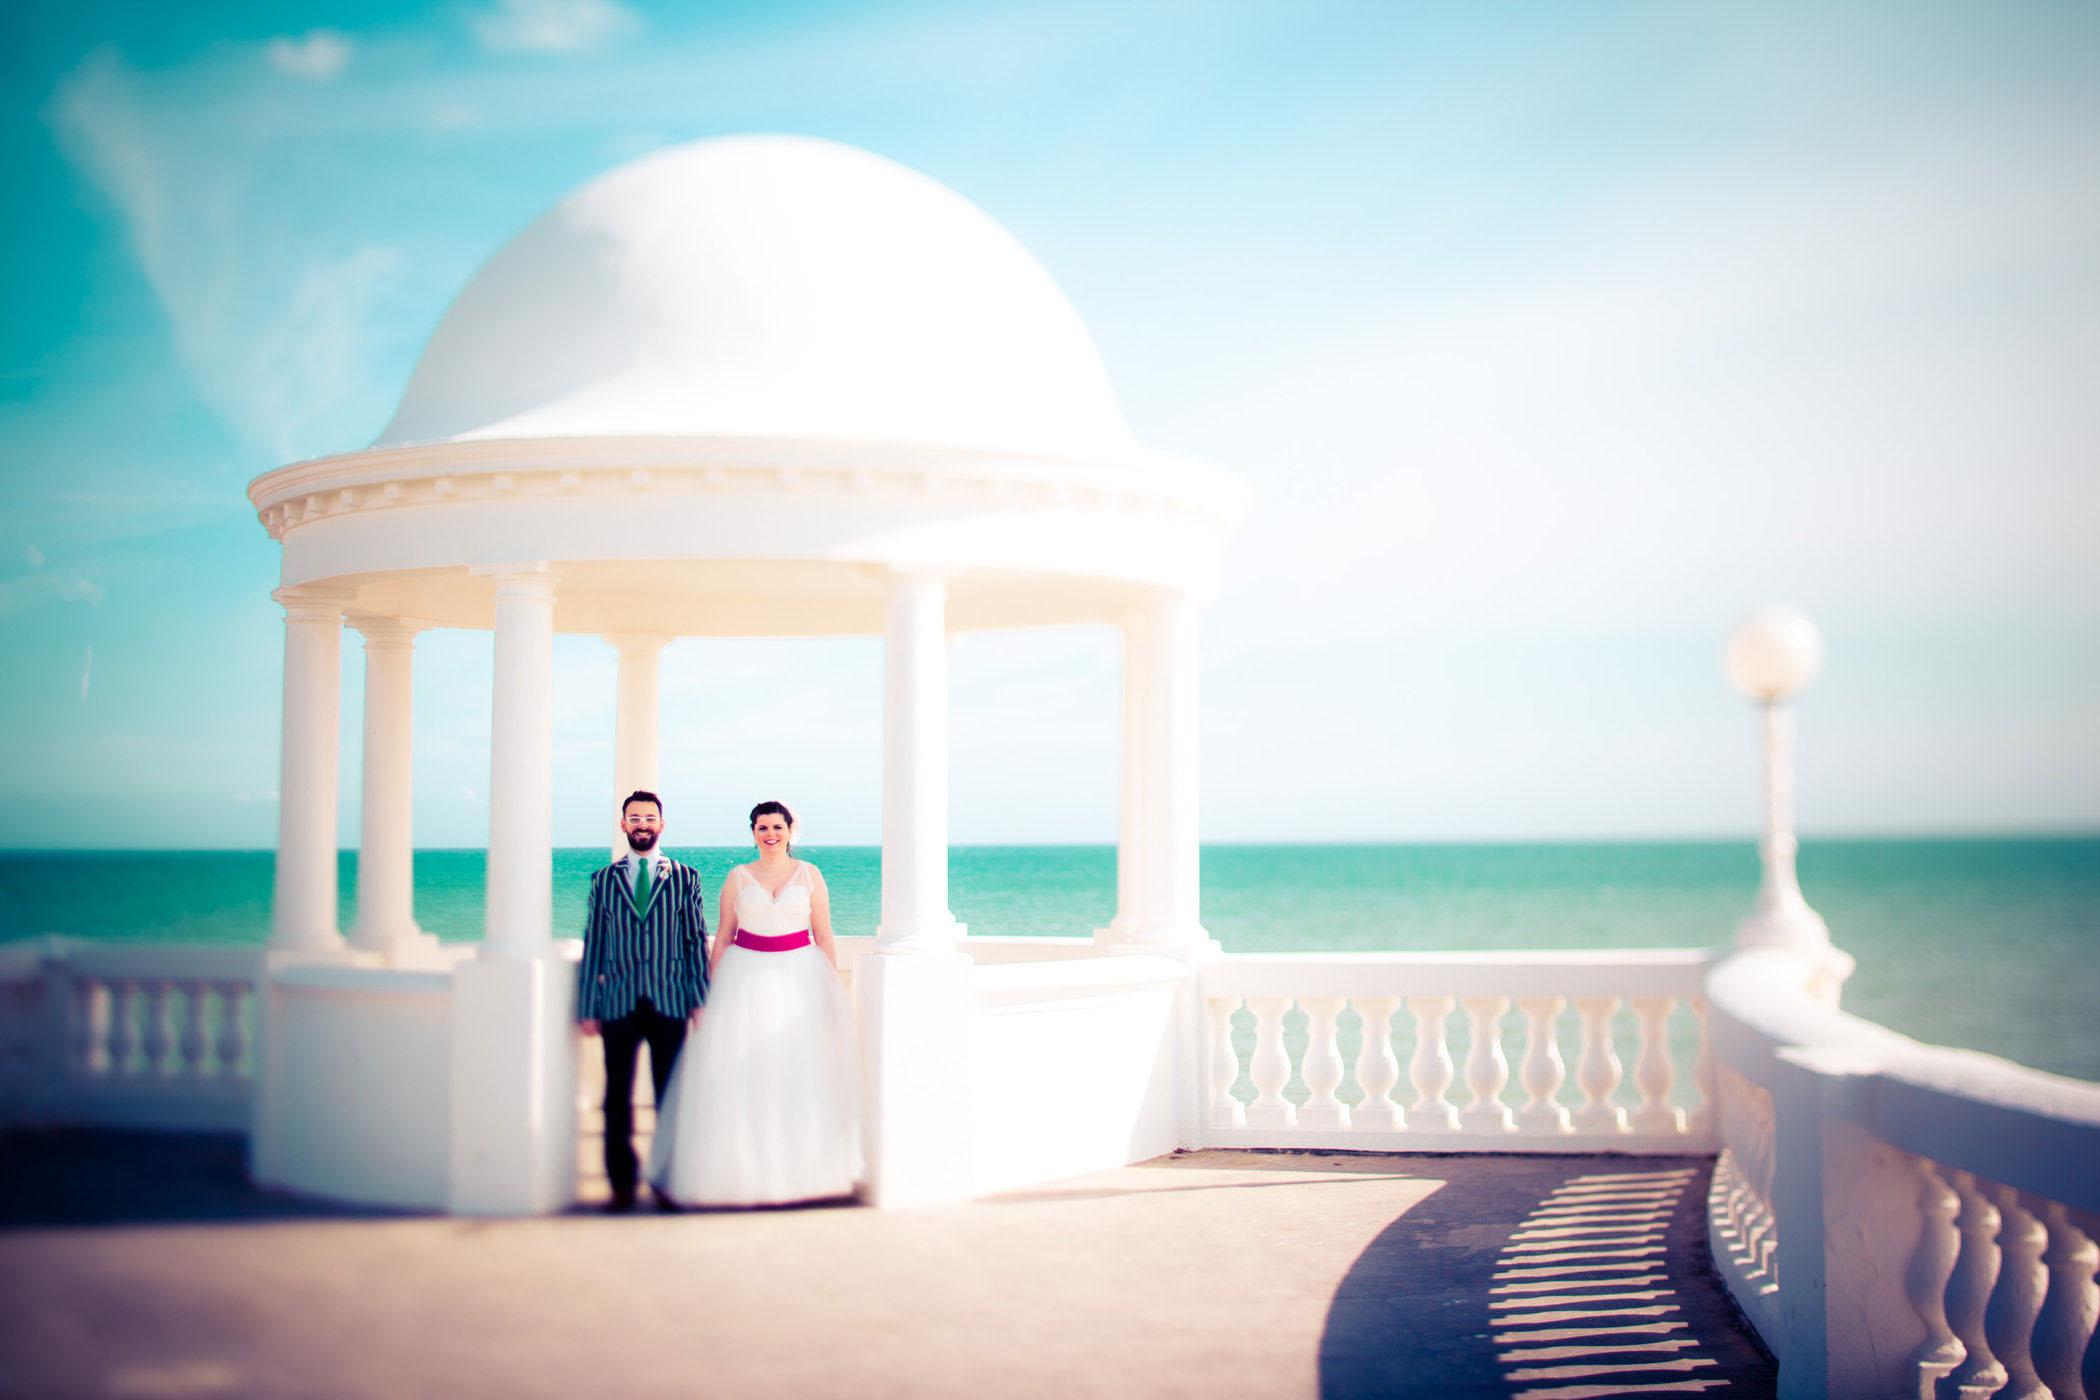 dan_burman_wedding_photography (1).jpg